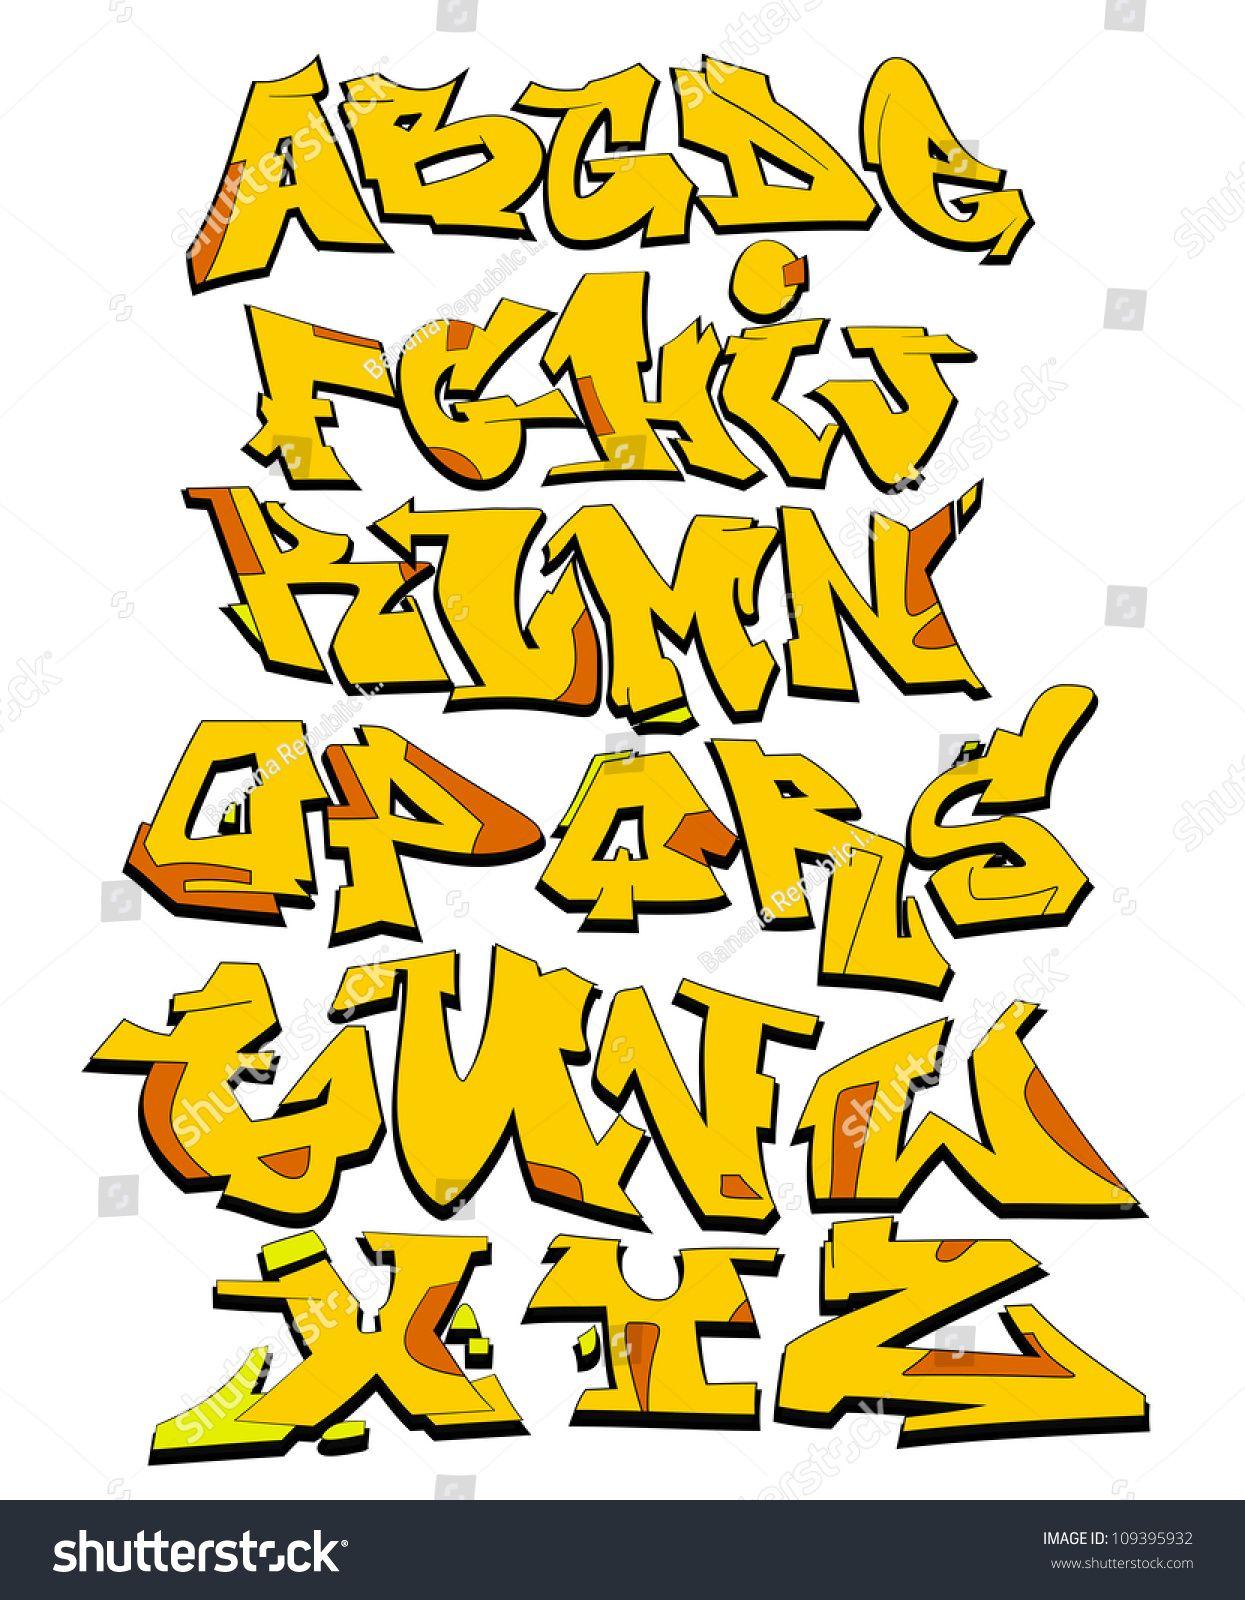 graffiti font alphabet urban art design graffiti buchstaben in 2019 pinterest graffiti. Black Bedroom Furniture Sets. Home Design Ideas